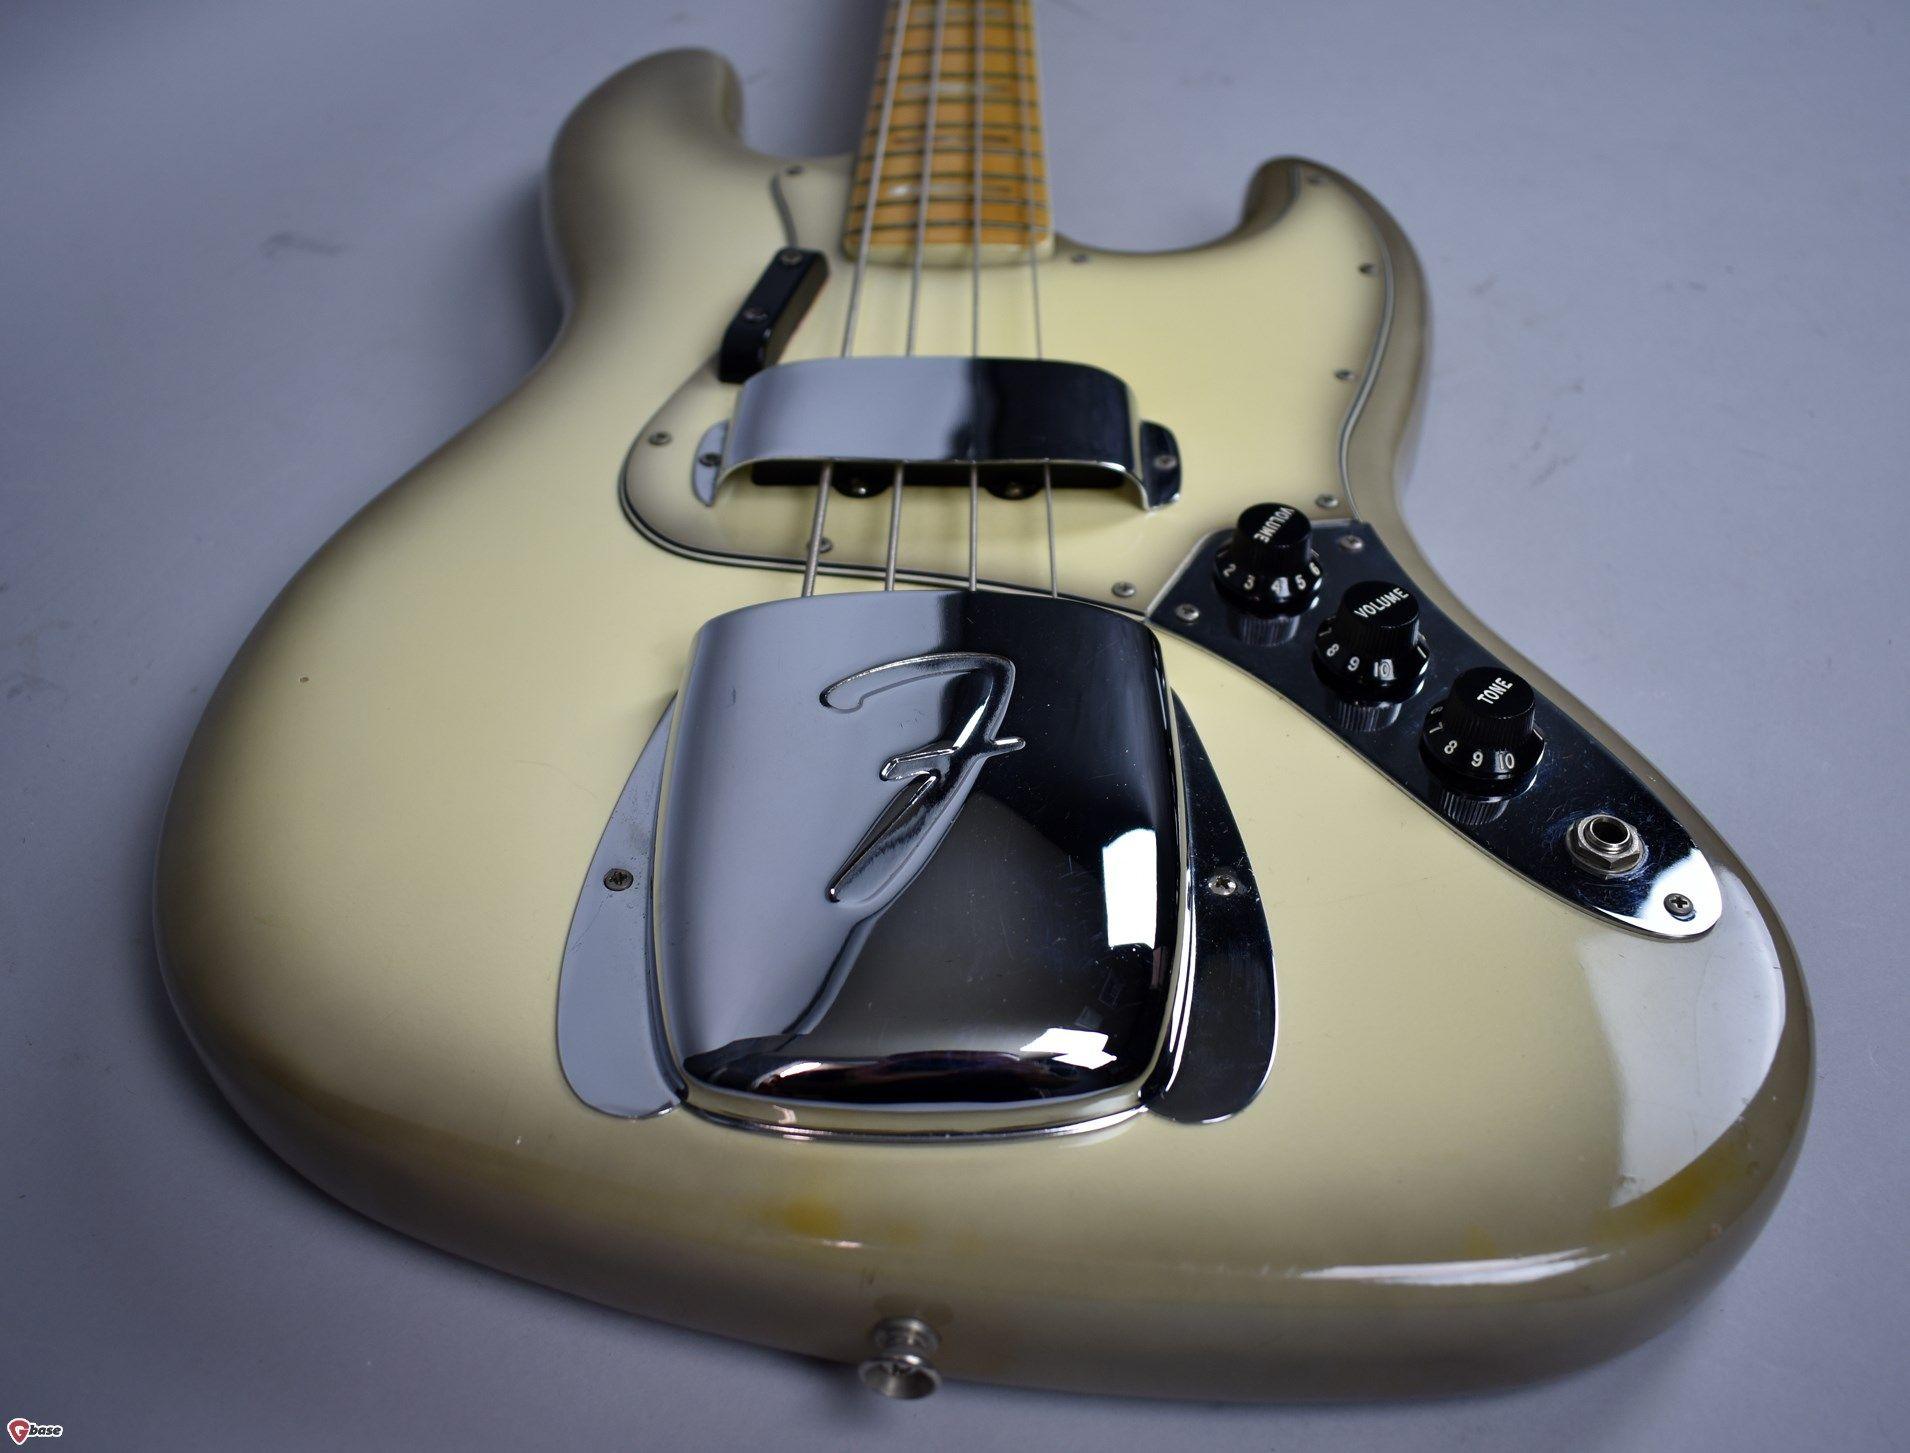 1978 Fender Jazz Bass Vintage American Antigua Finish Electric Guitar W Antigua Guitars Bass Imperial Vintage Guitars Guitar Fender Jazz Bass Fender Jazz